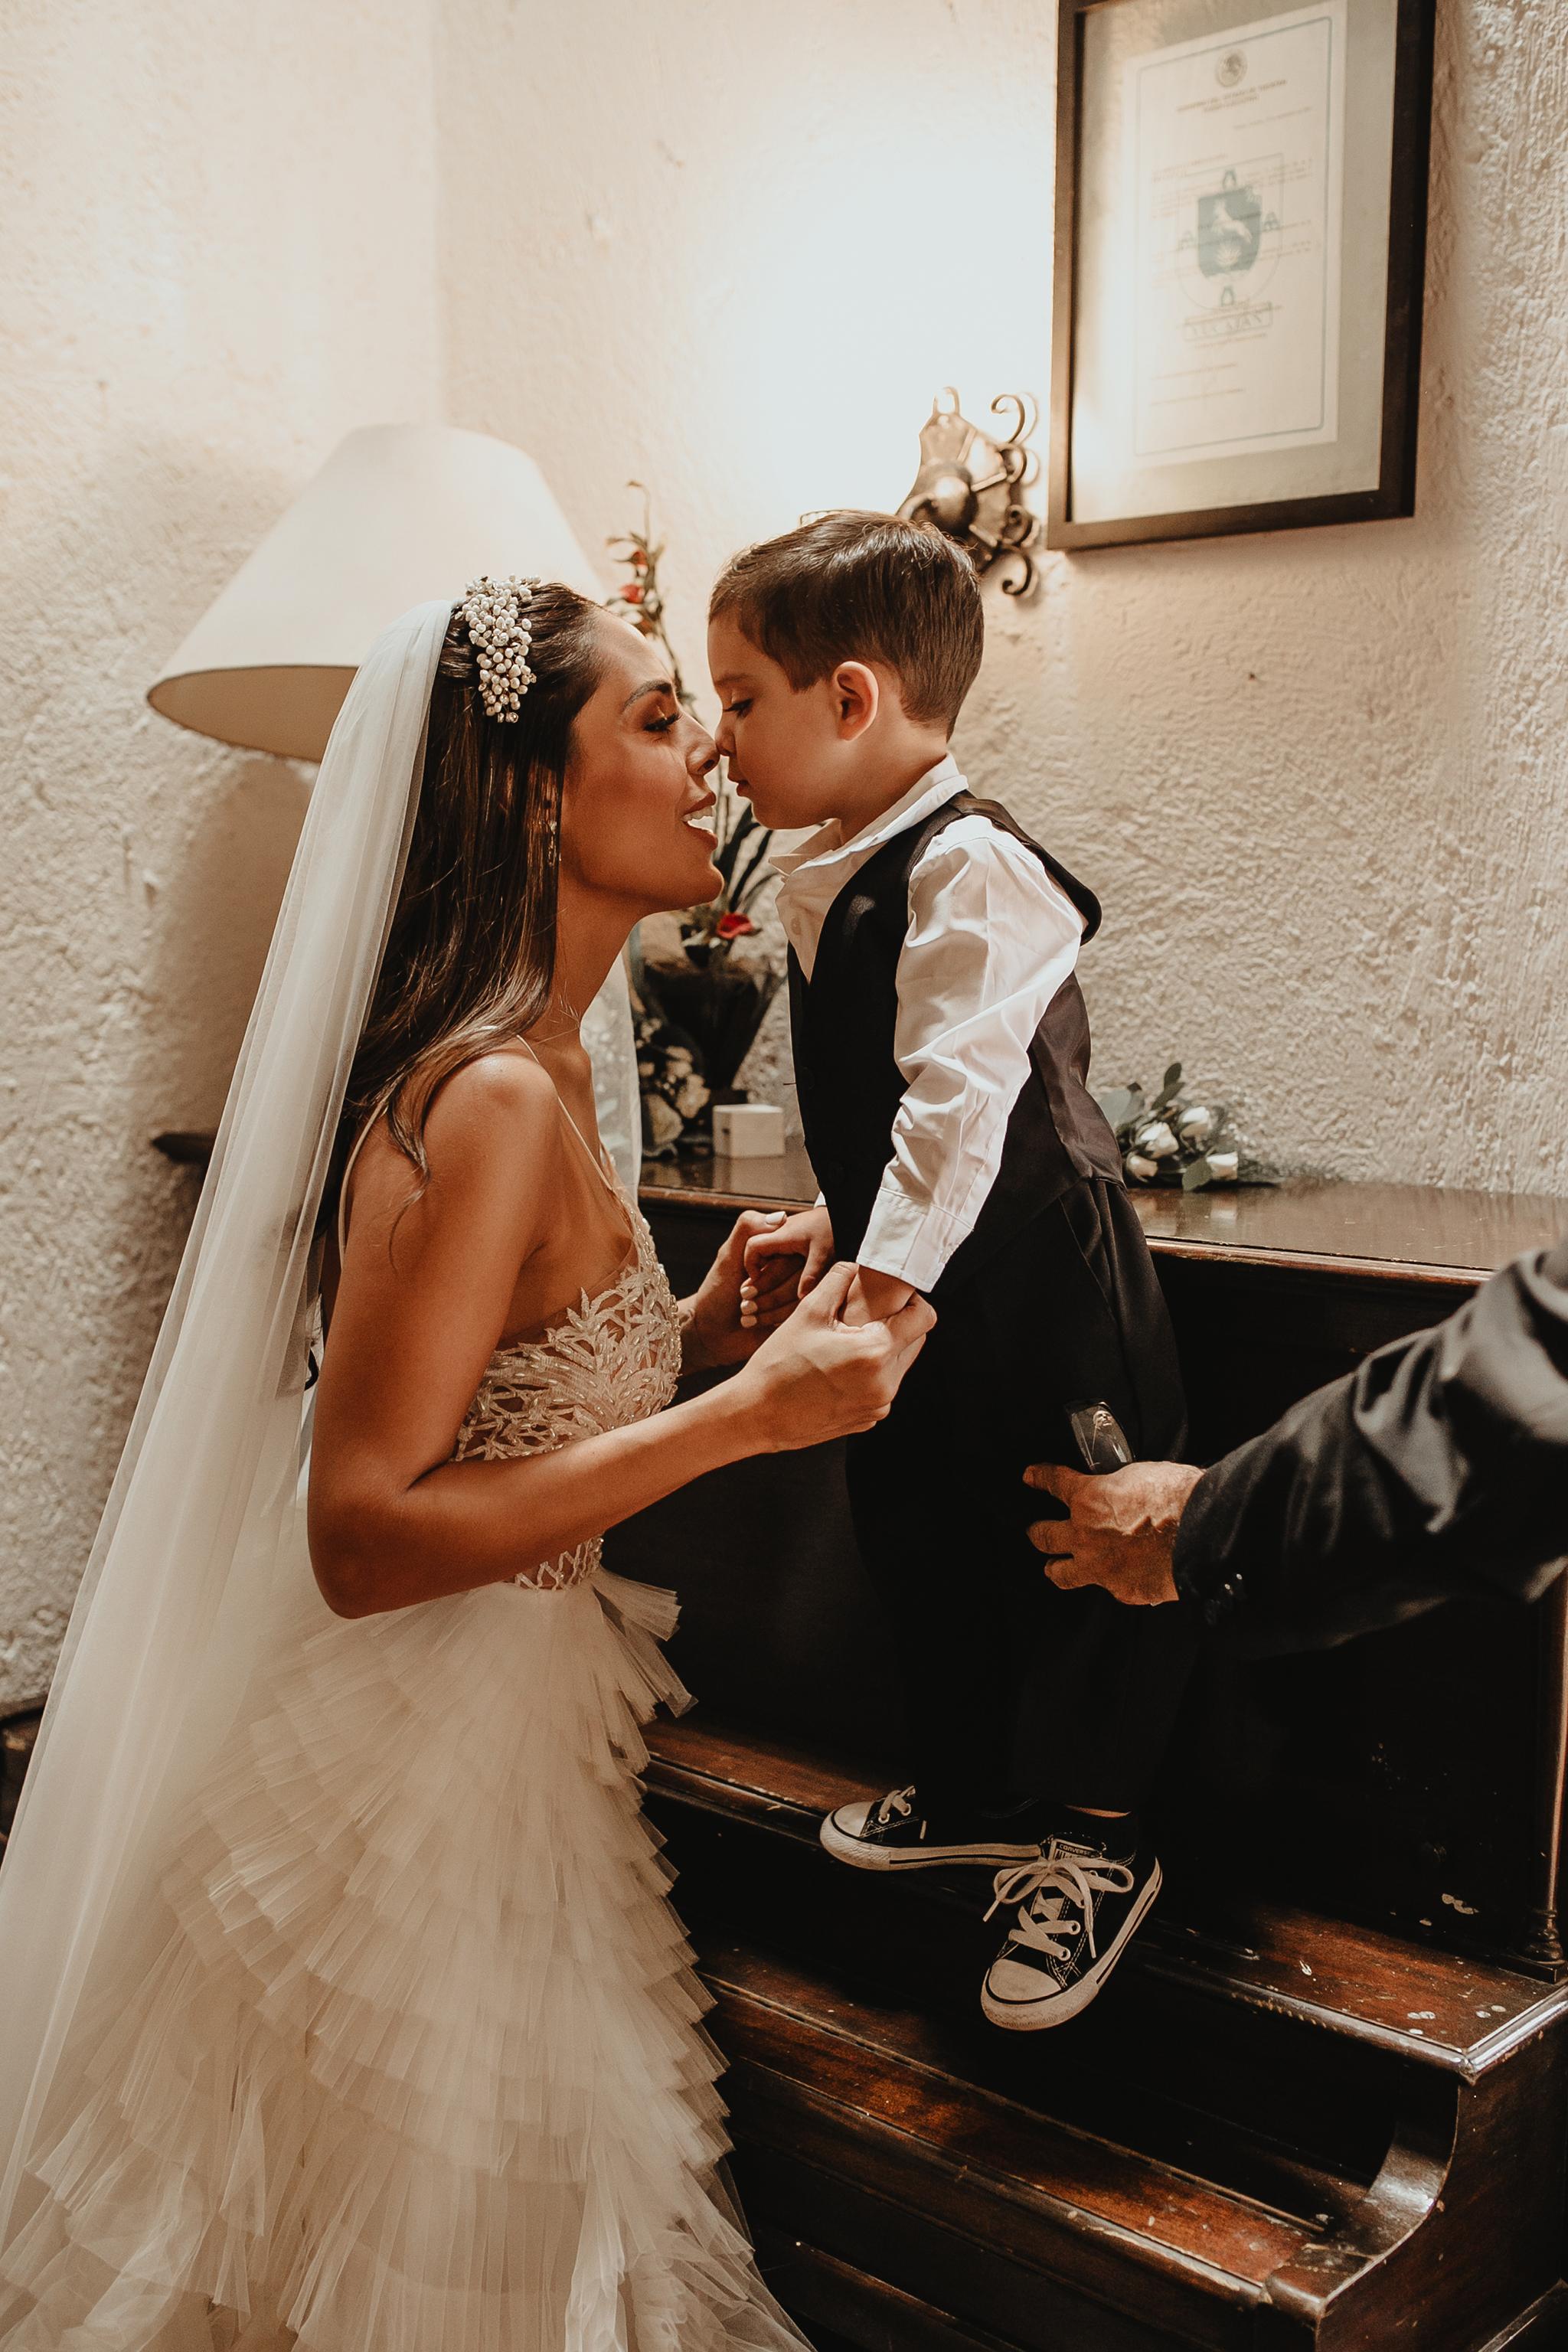 0258R&F__WeddingDestination_Weddingmerida_BodaMexico_FotografoDeBodas_FabrizioSimoneenFotografo.jpg